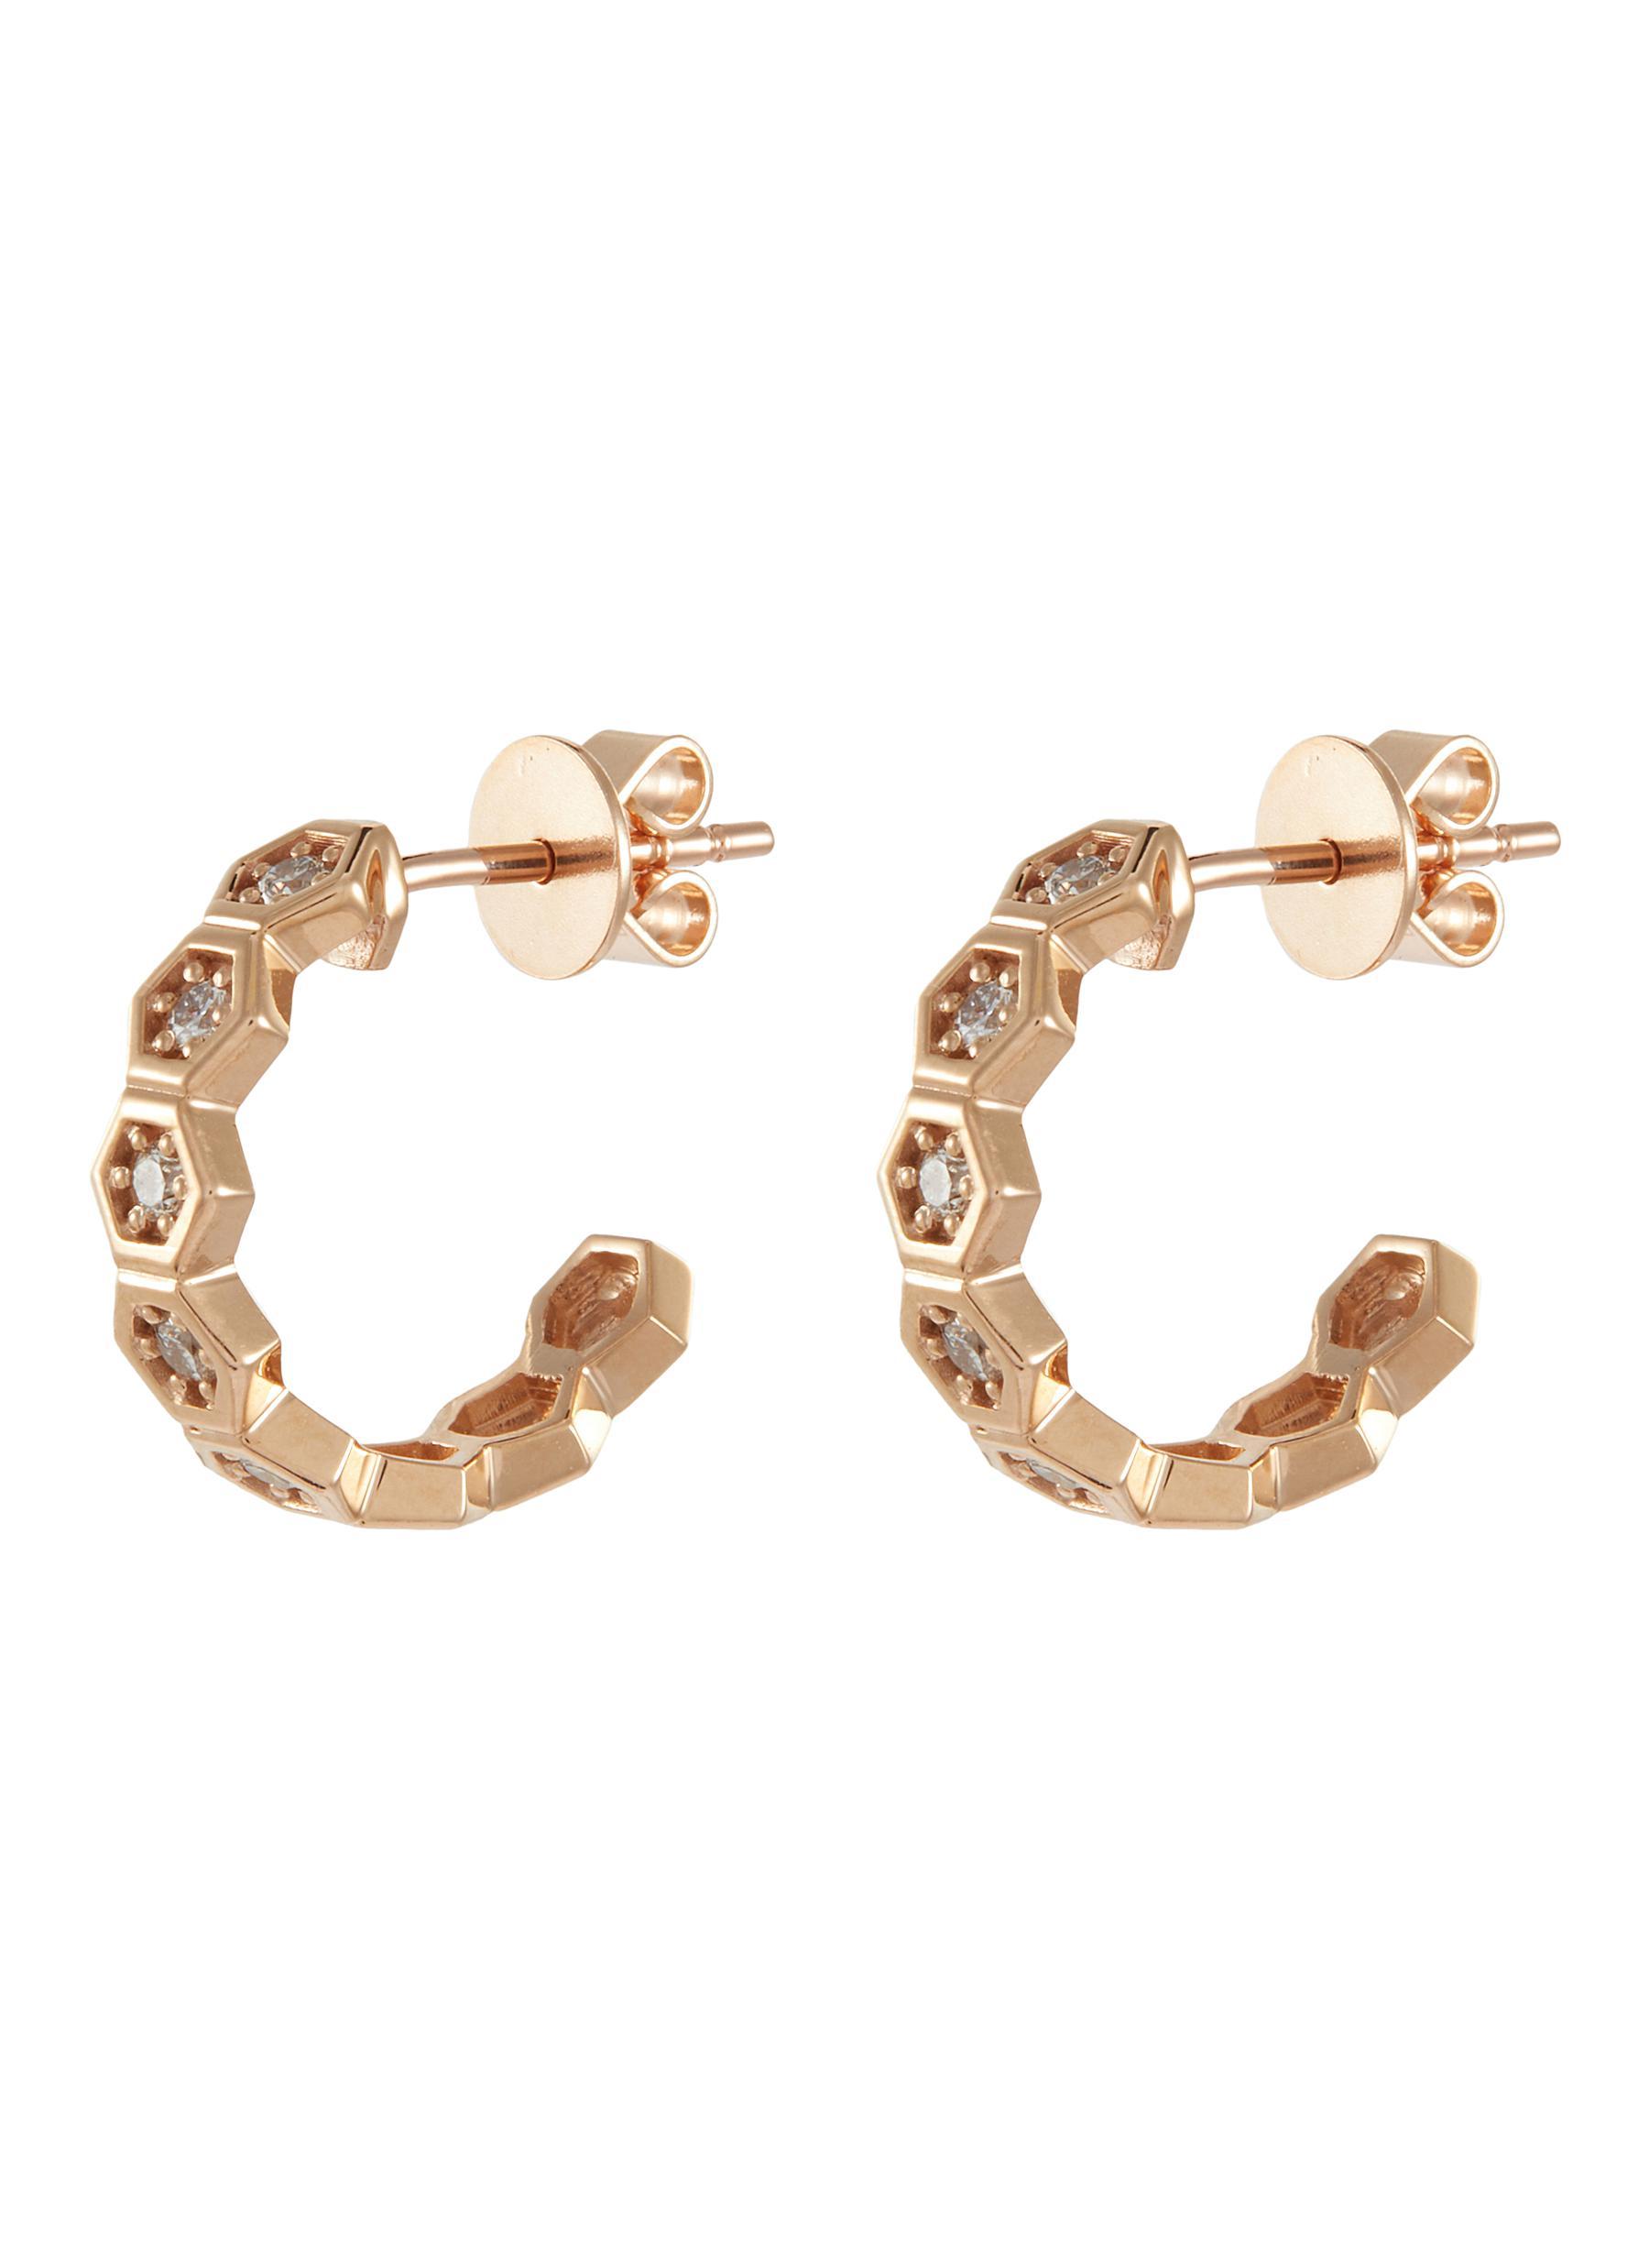 Diamond 14k Rose Gold Honeycomb Loop Earrings - BEE GODDESS - Modalova